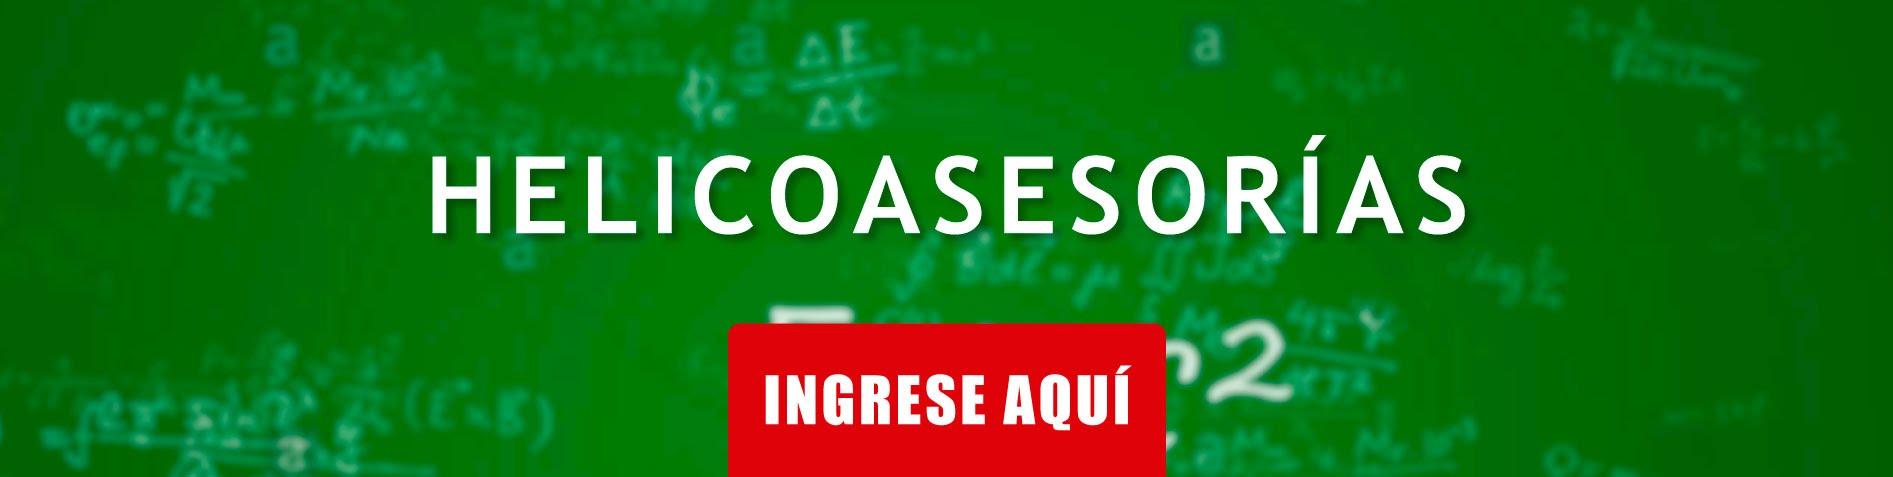 http://sedes.sacooliveros.edu.pe/helicoasesorias/